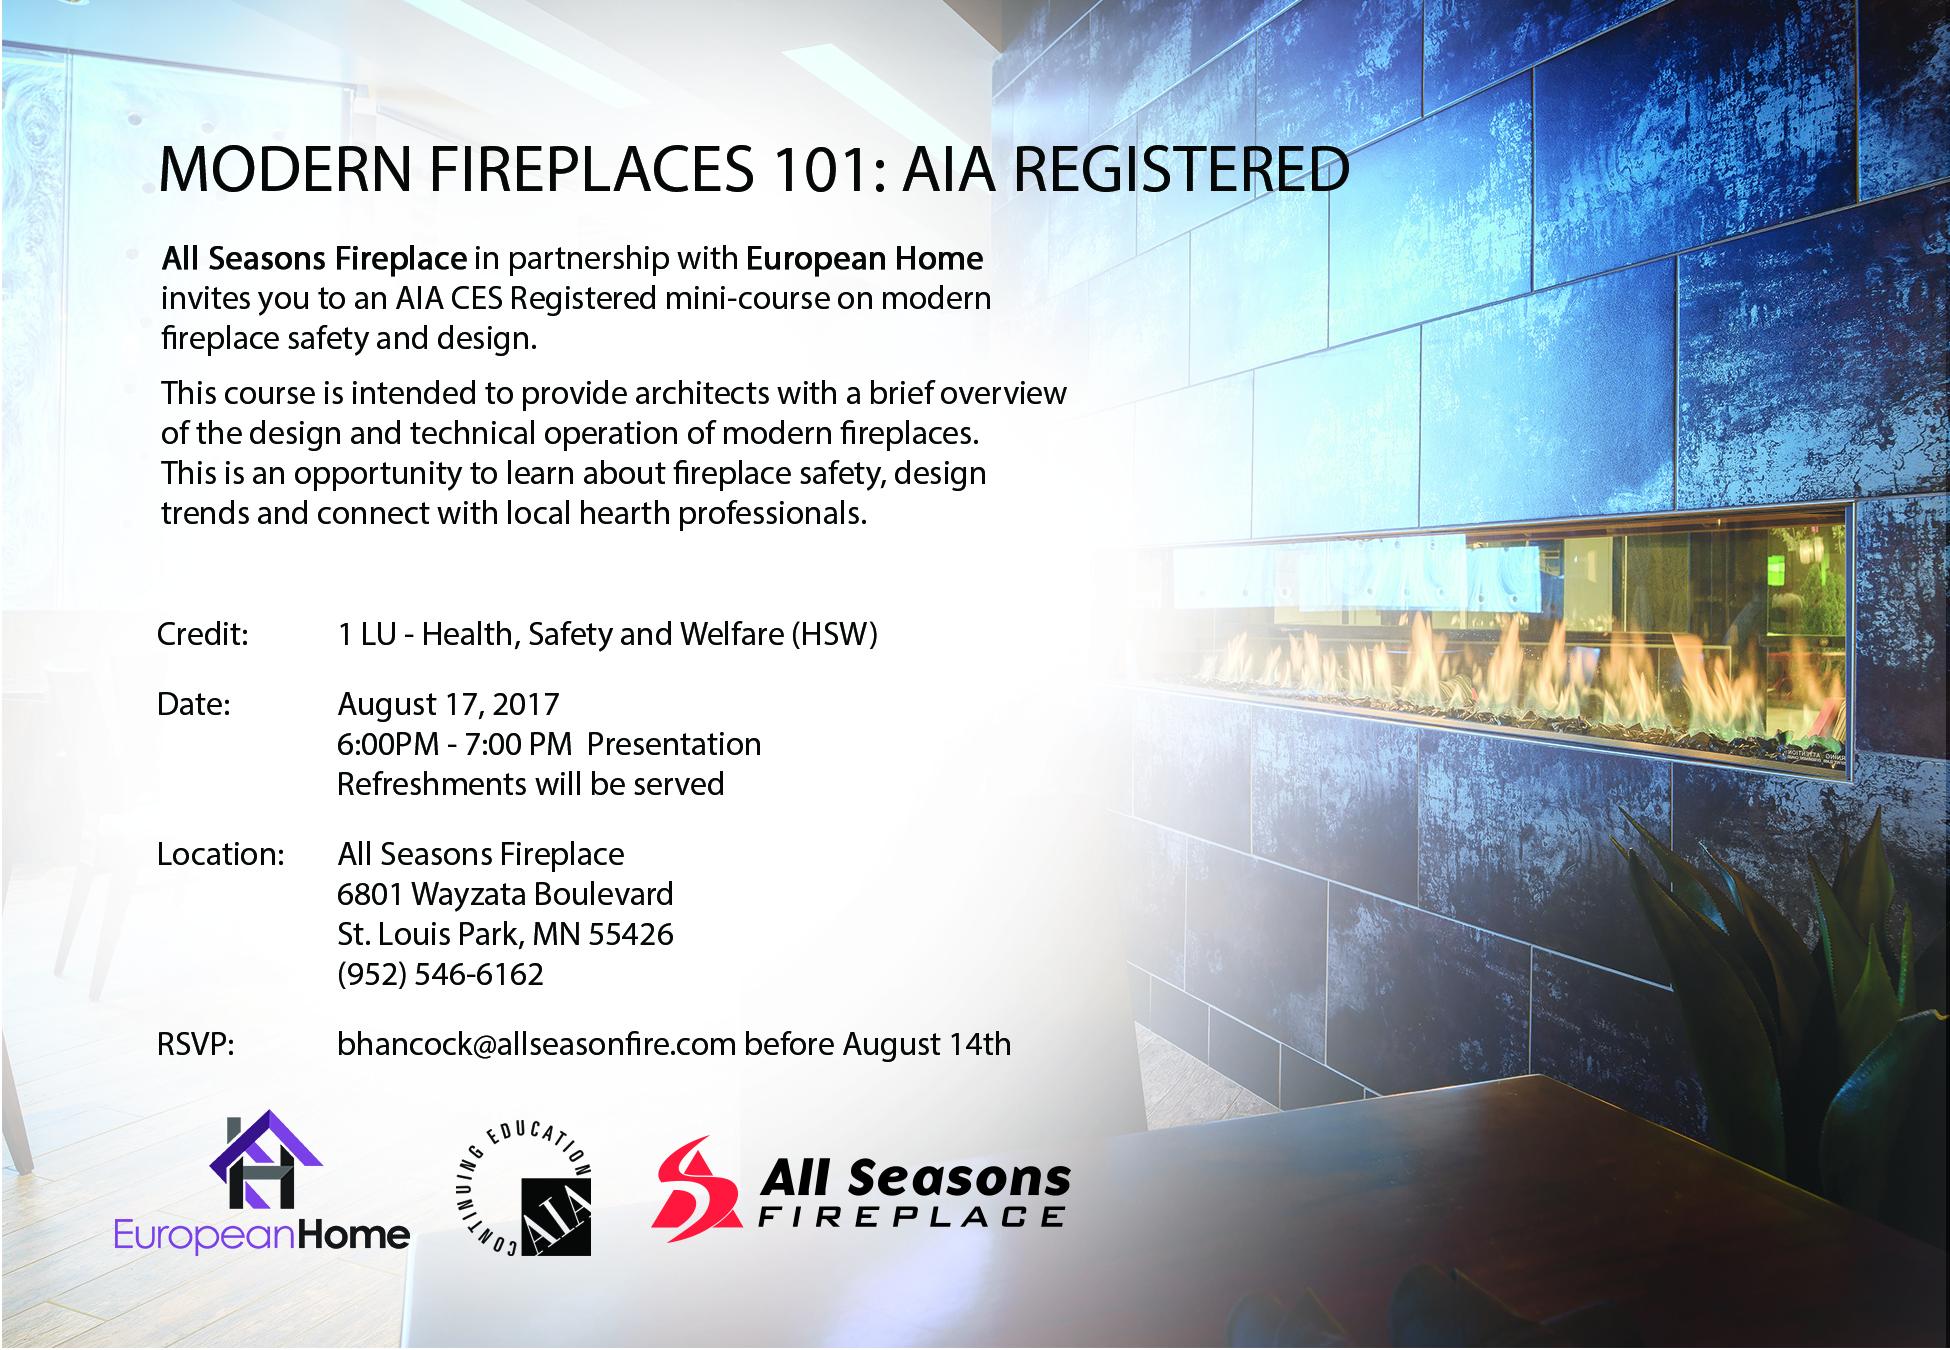 Fireplace Design Seminar at All Seasons Fireplace